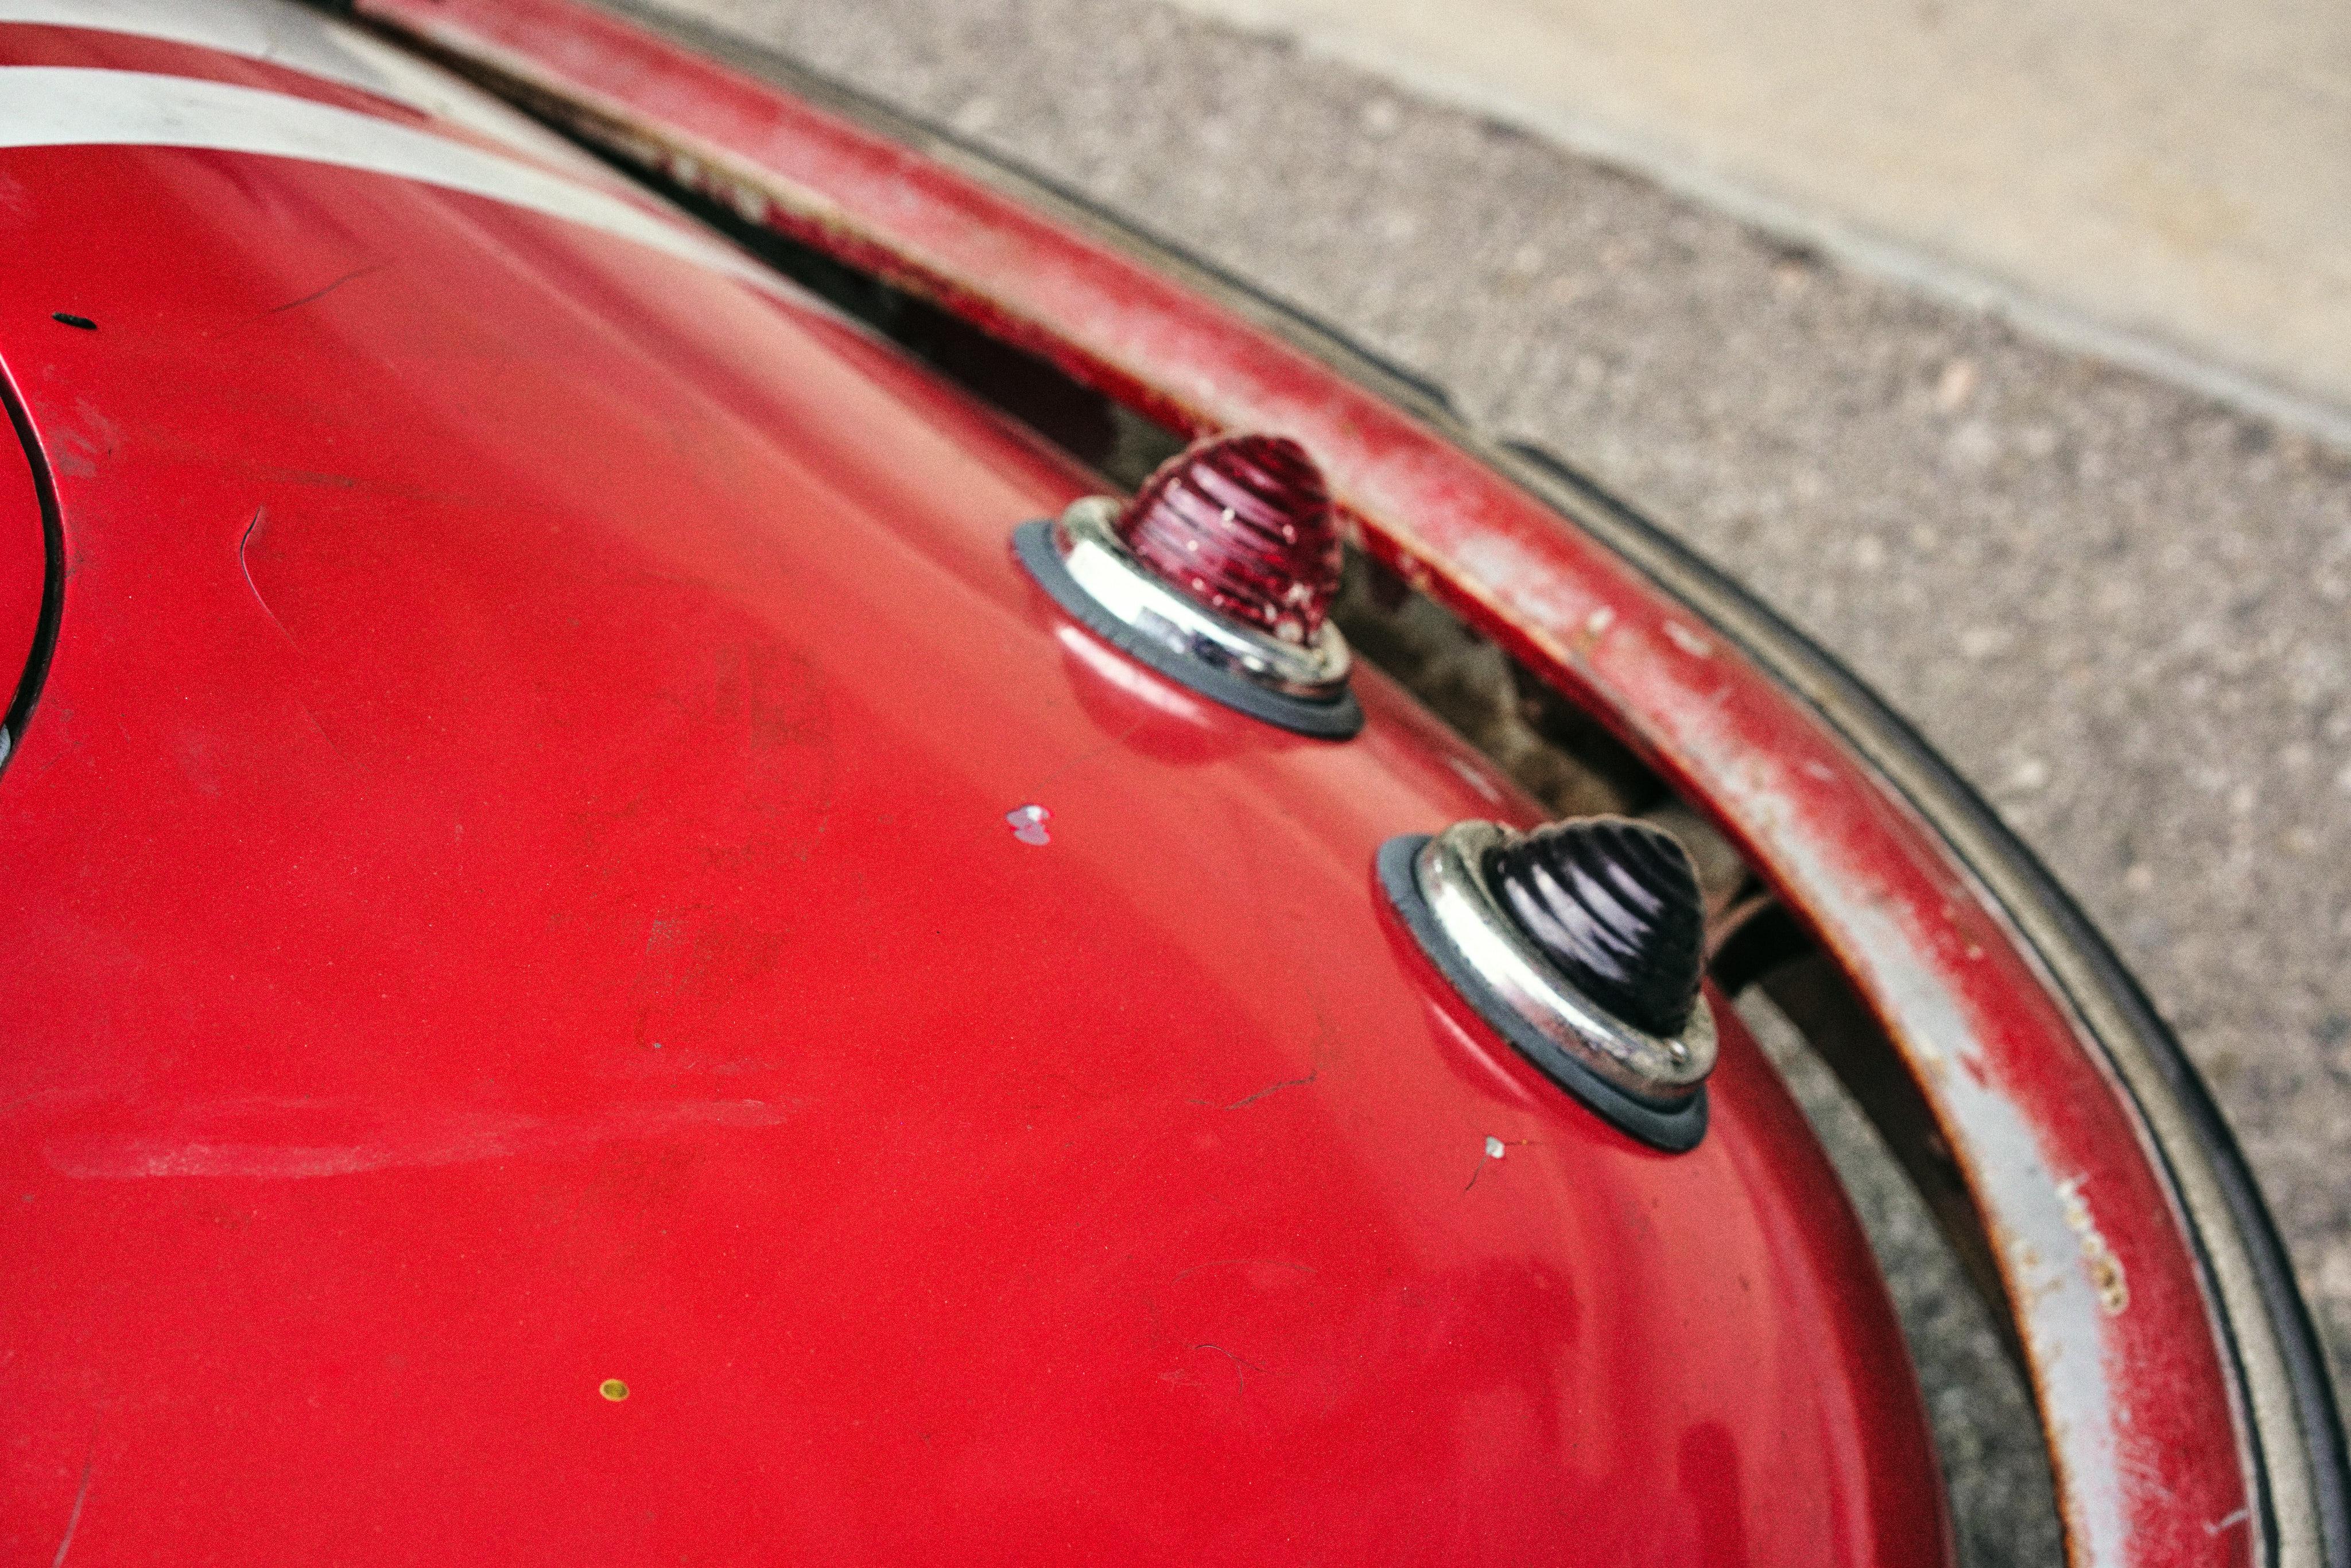 Luftgekühlt-6-Rennen-51-Porsche-356-1955-Rod-Emory-Driver-Beehives